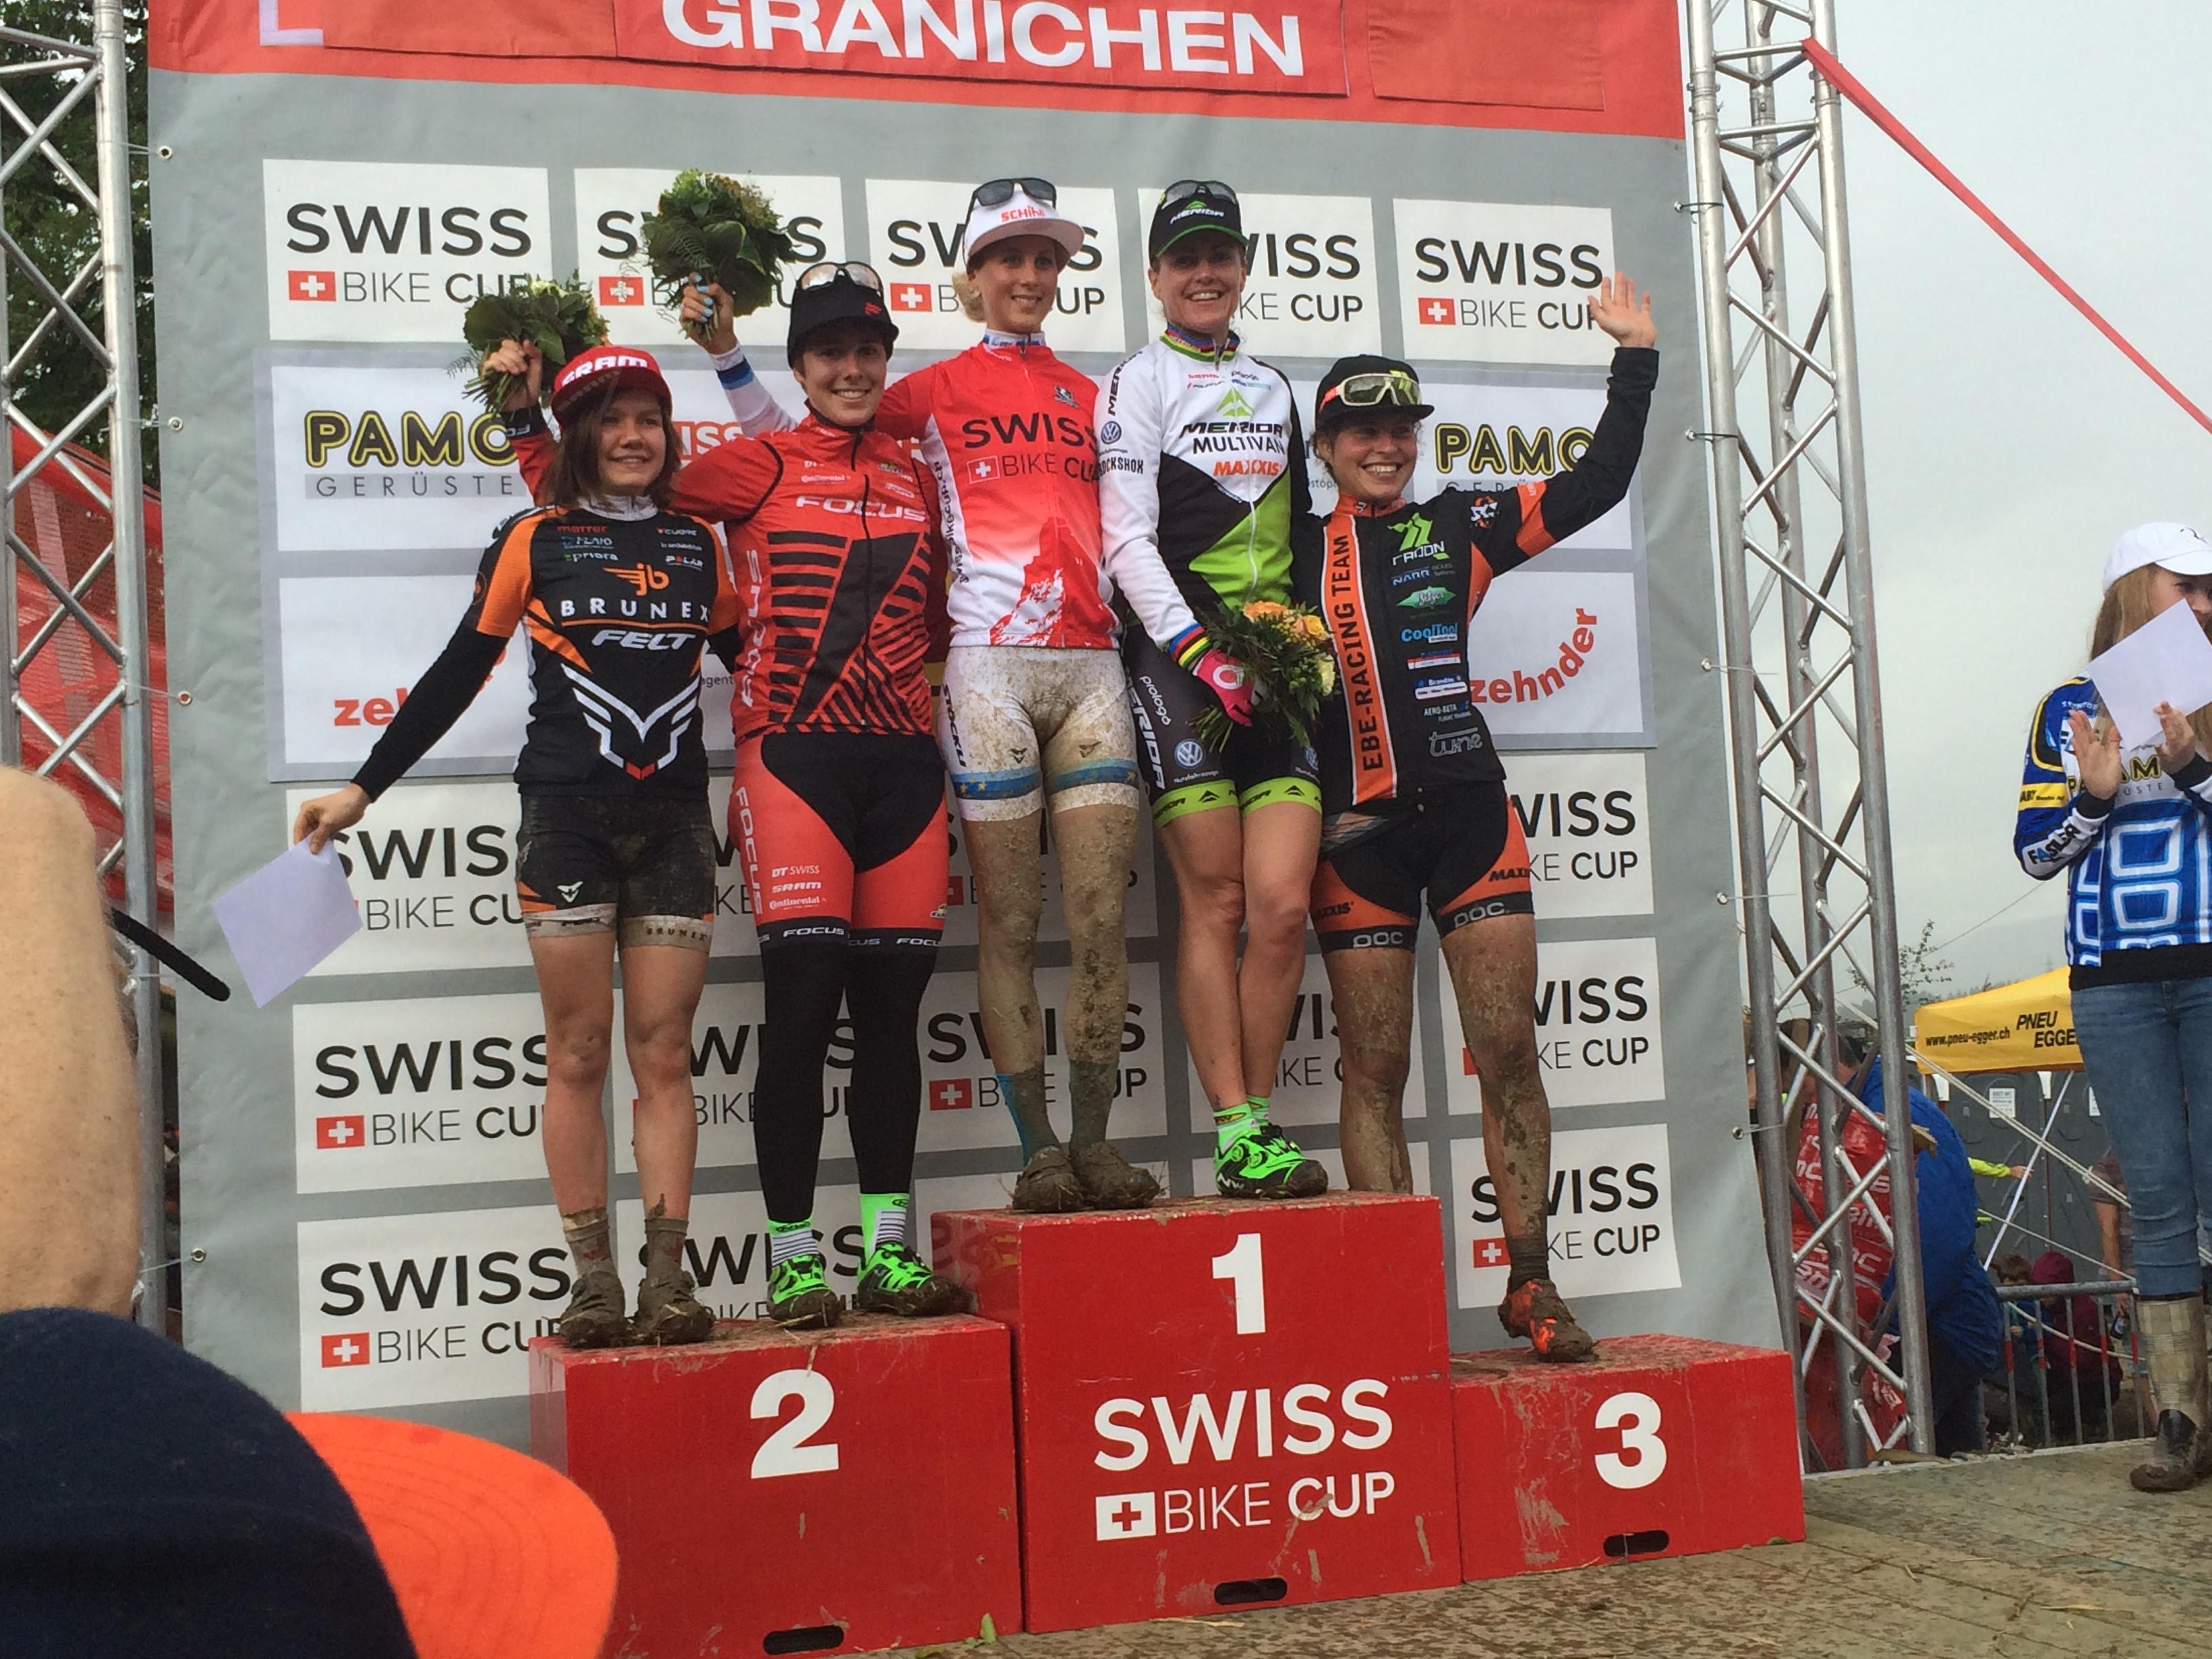 Graenichen Swiss Bike Cup